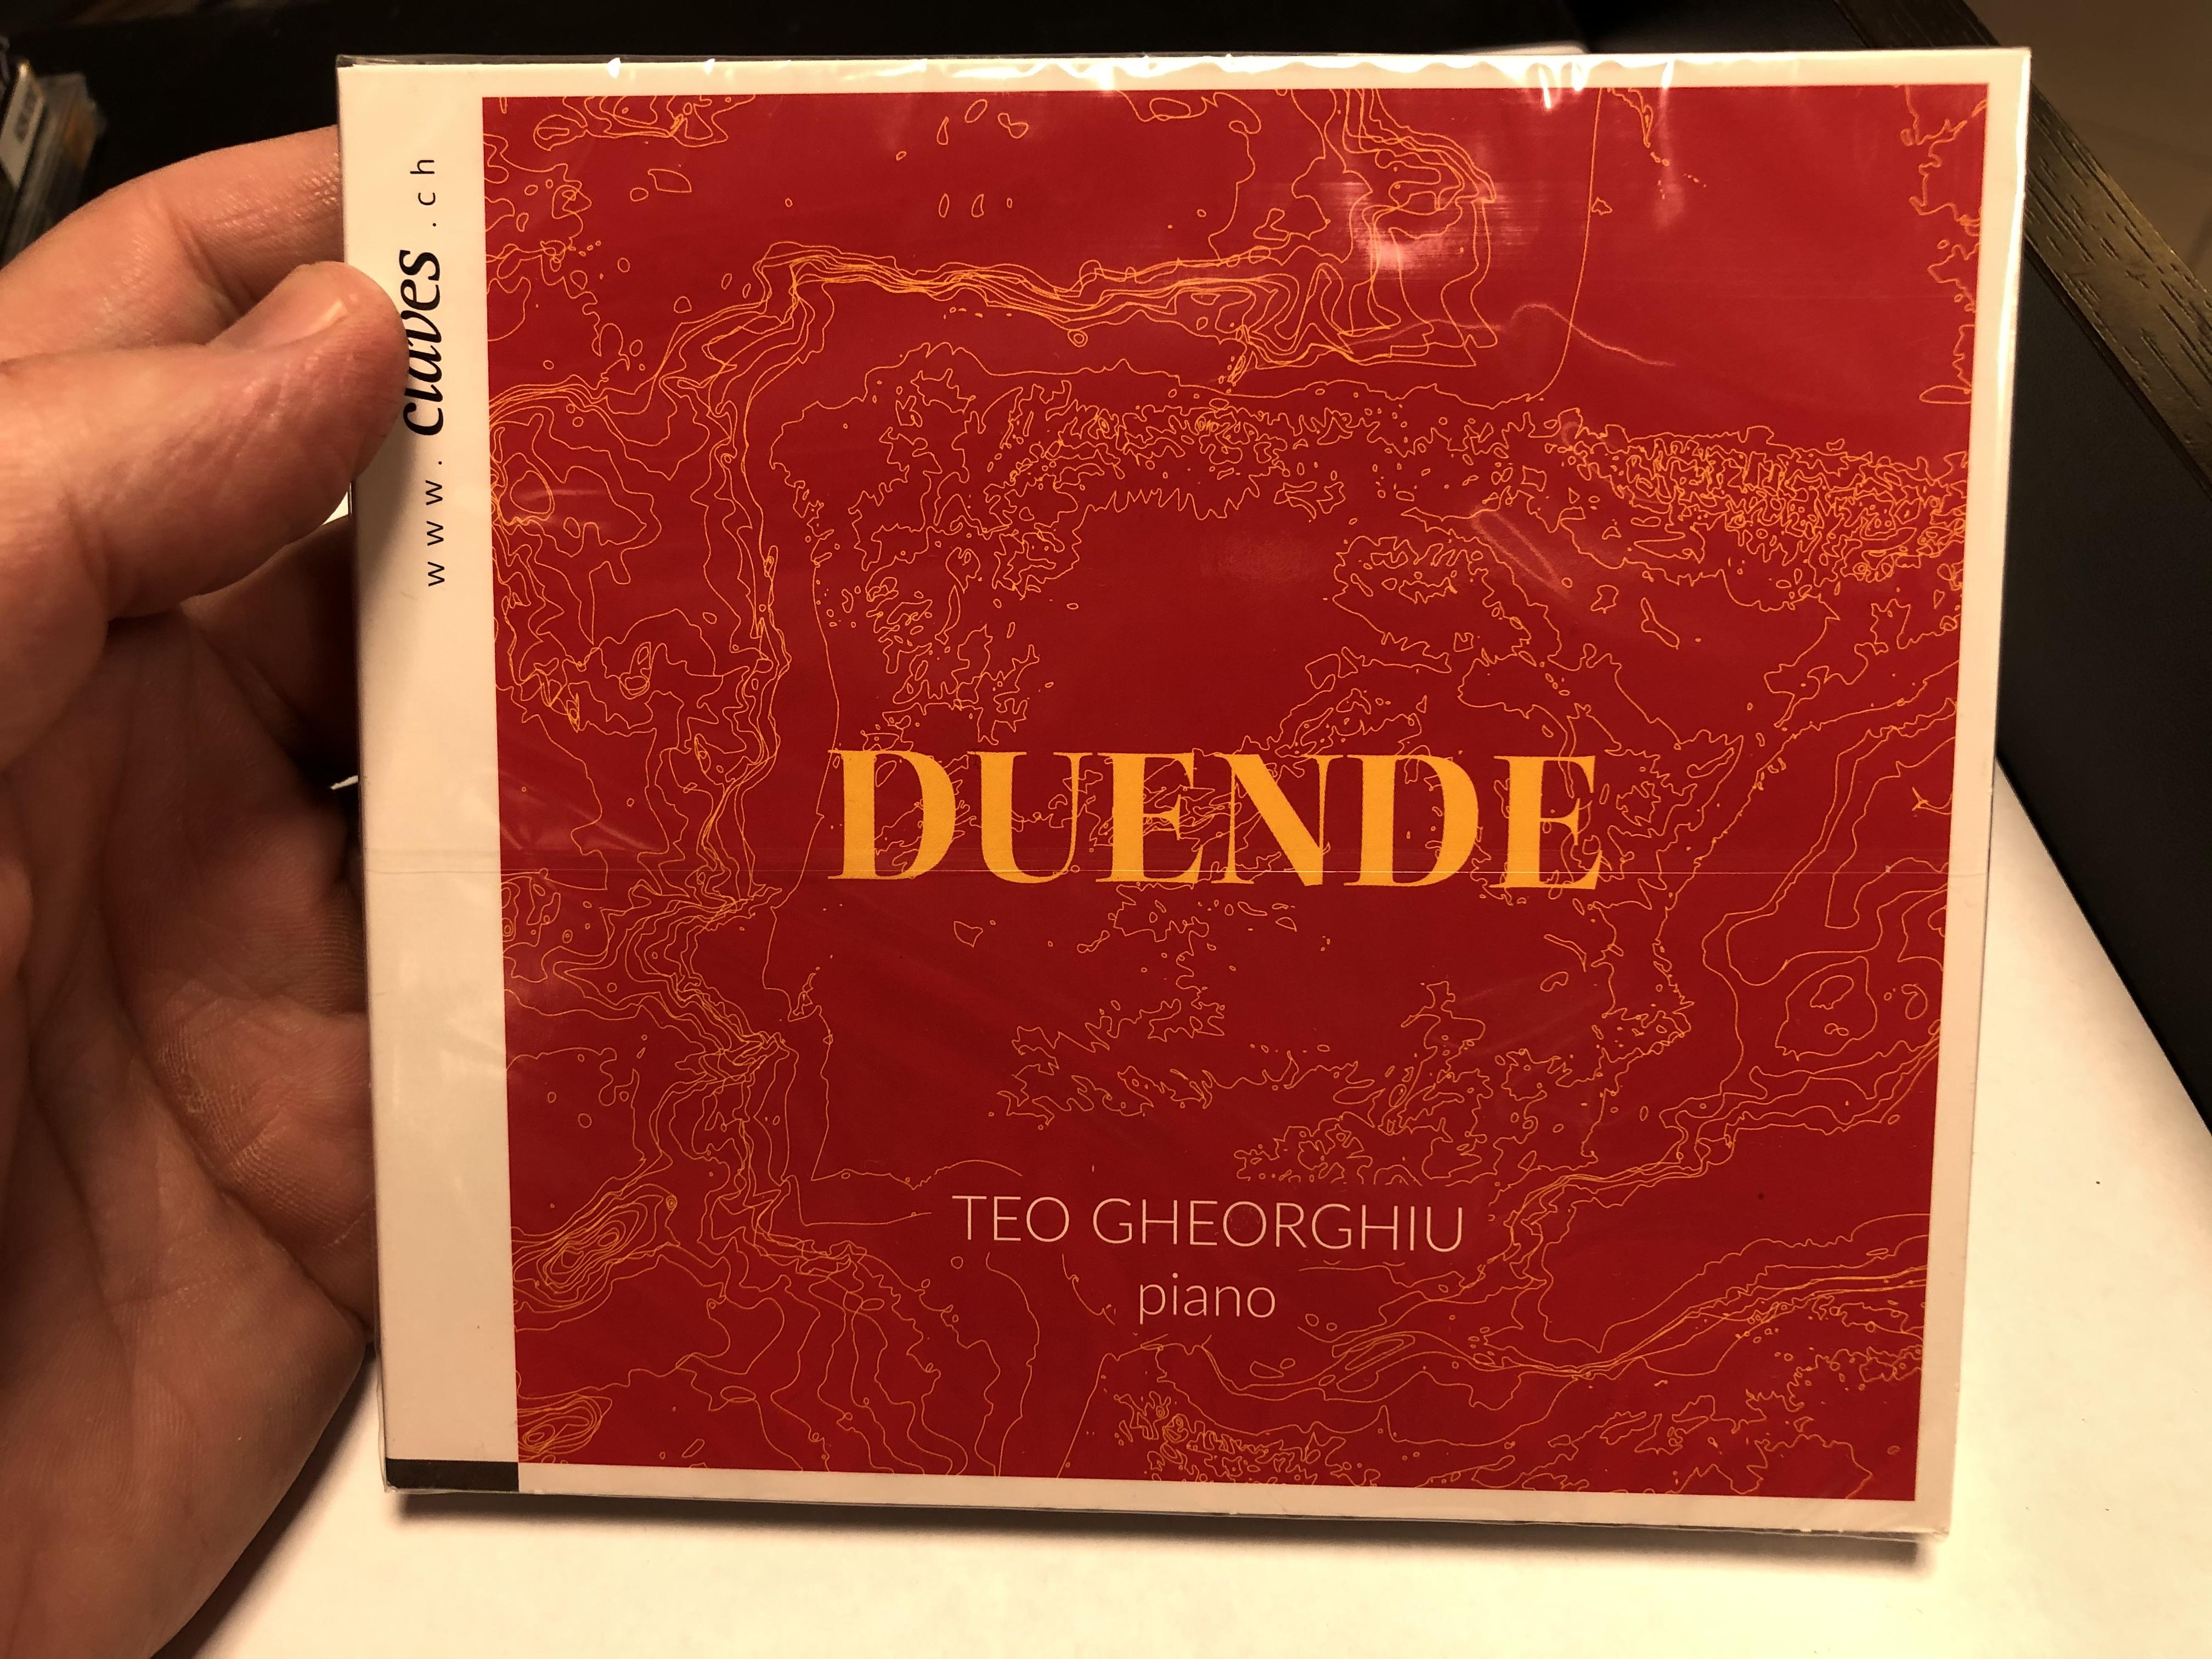 duende-teo-gheorghiu-piano-claves-records-audio-cd-2020-7619931302126-1-.jpg